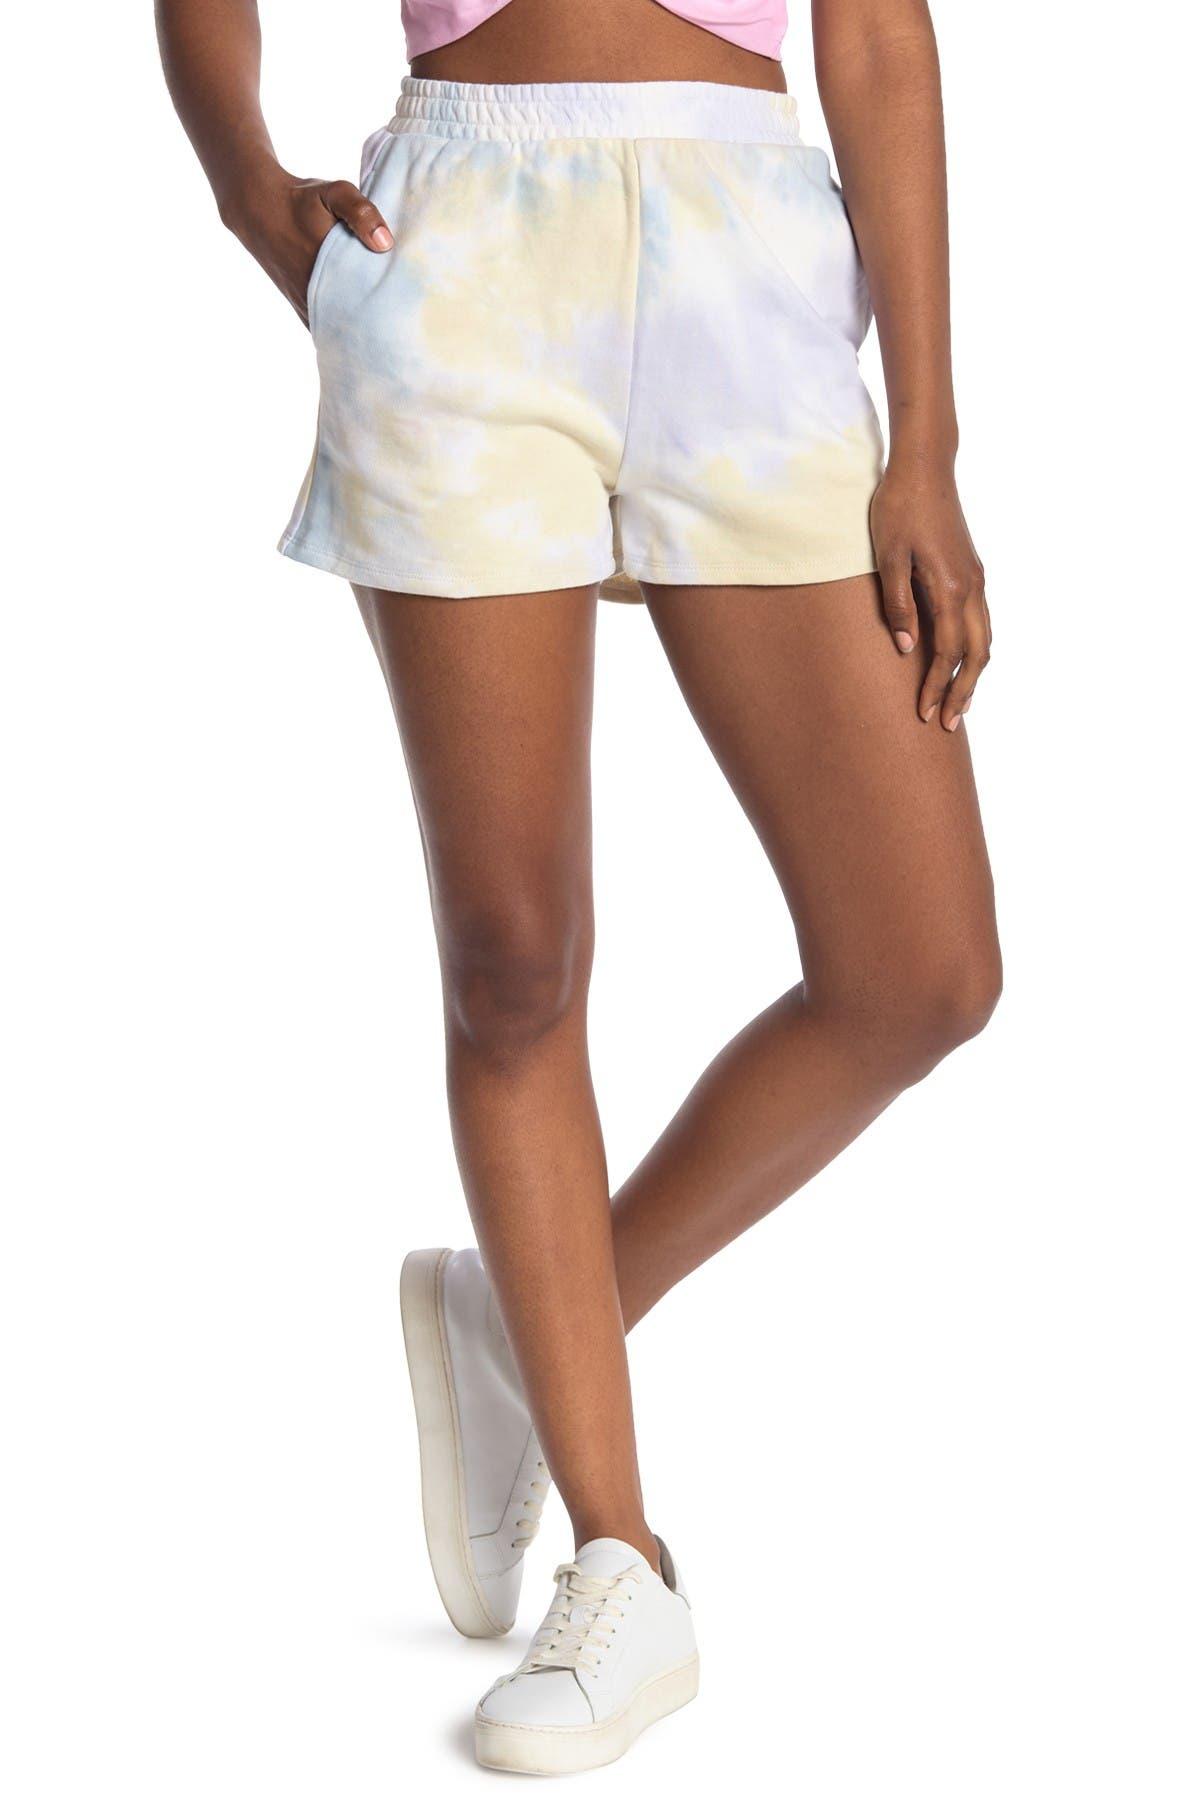 Image of Elodie Tie Dye Knit Shorts